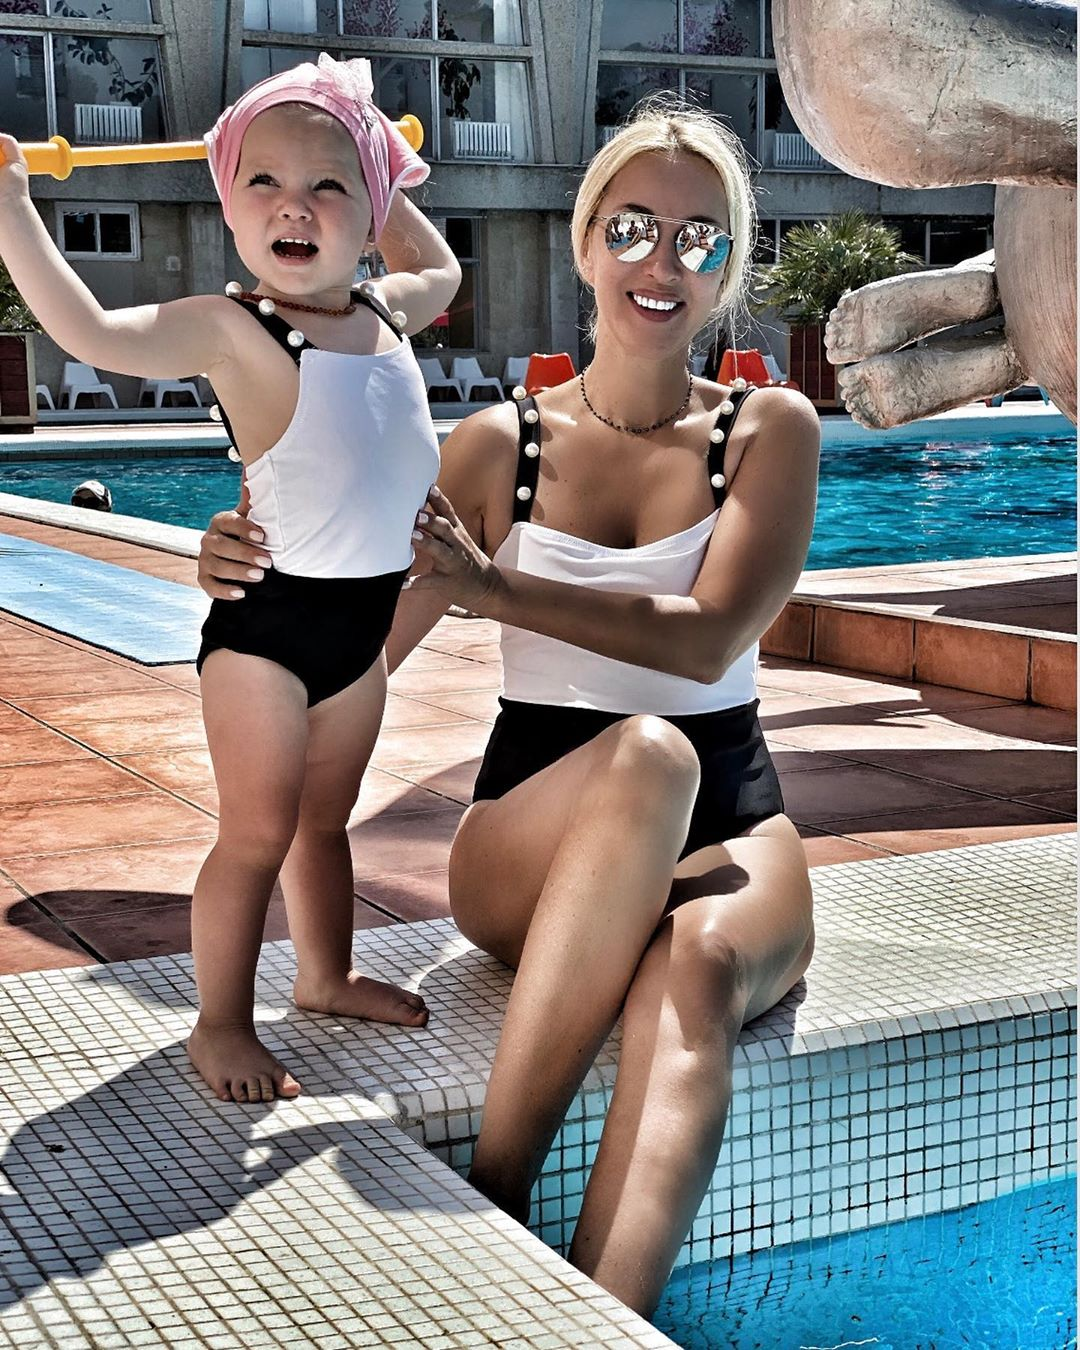 Лера Кудрявцева с дочкой наЧерном море. Фото: leratv/Instagramleratv/Instagram